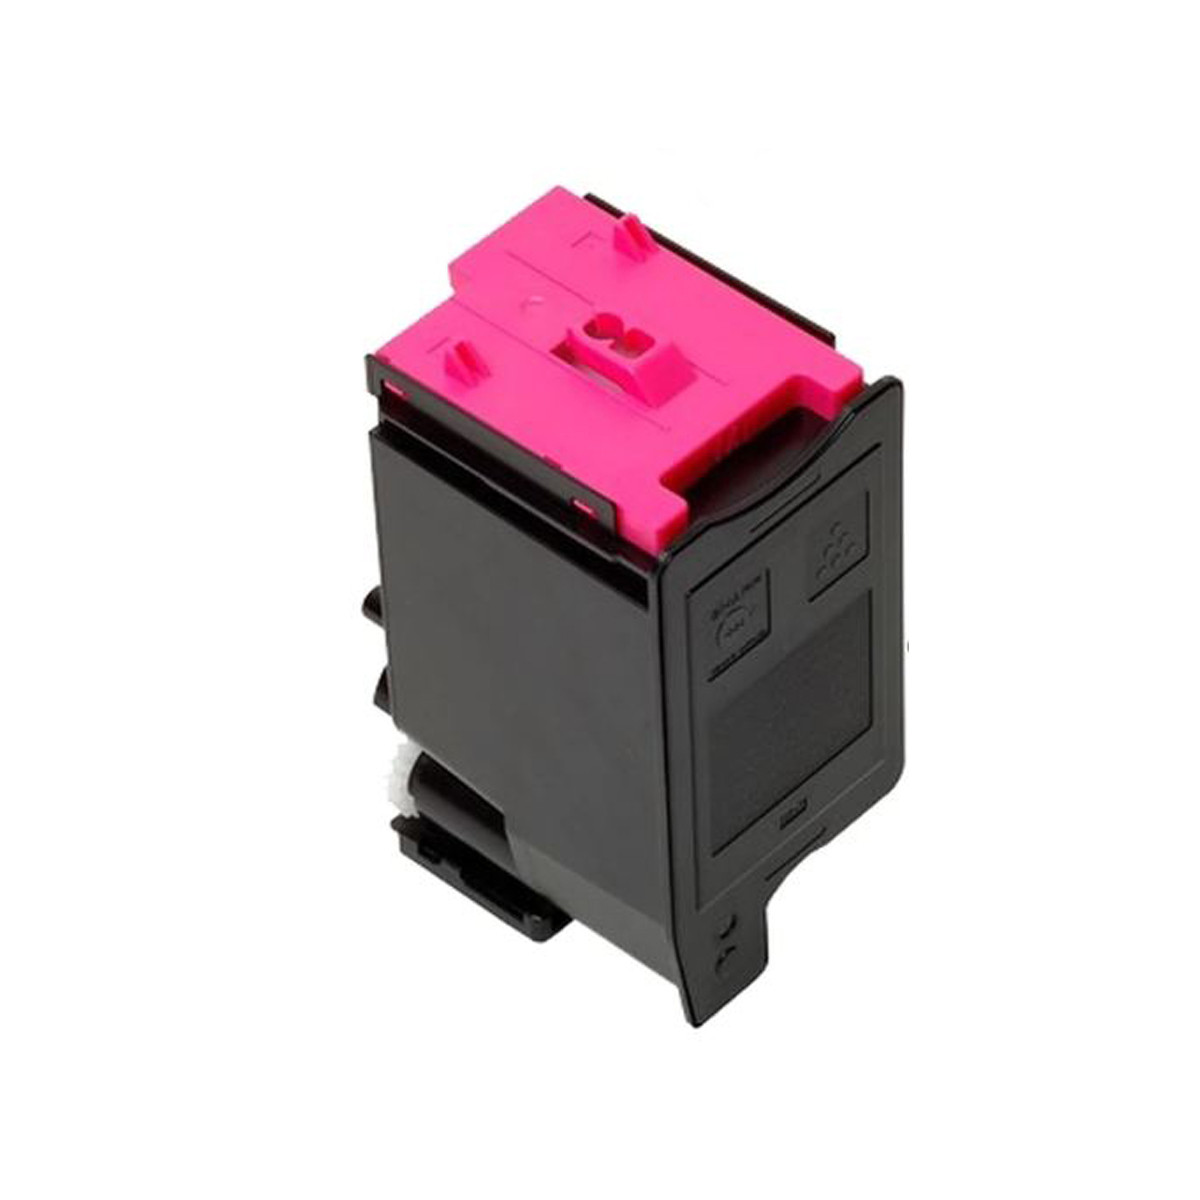 Toner Sharp MX-C30NTM Magenta | MX250 MX300A MX300F MX300P MX300 | Katun Business Color 125g